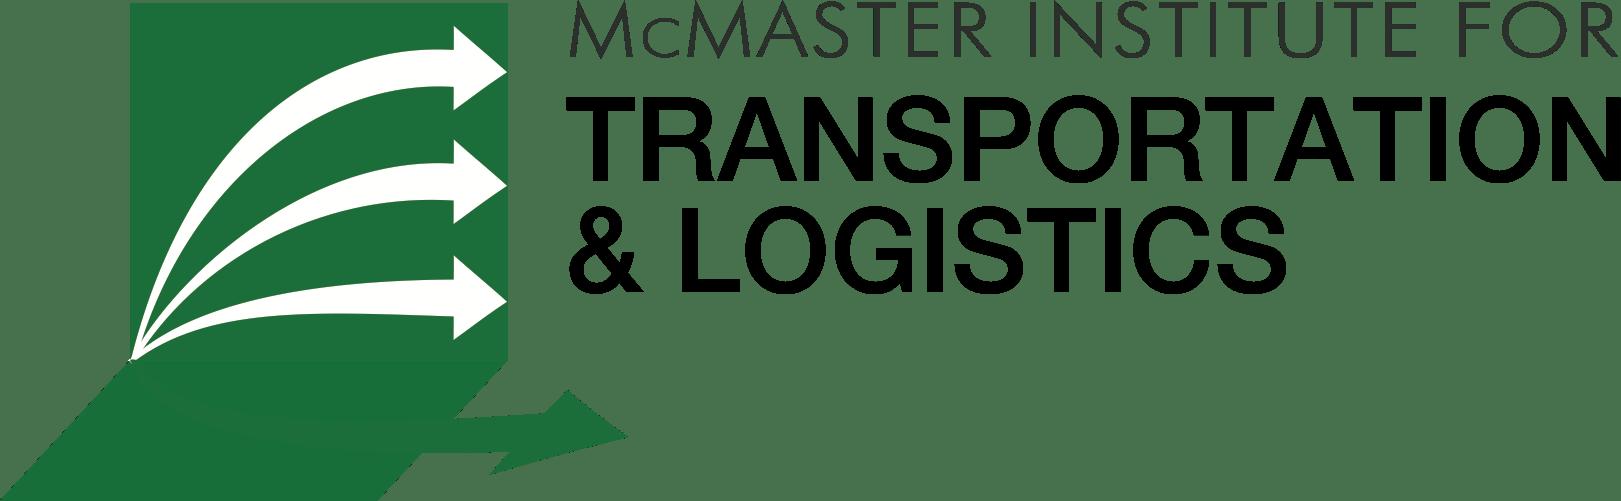 McMaster University Institute for Transportation Logistics (MITL) logo